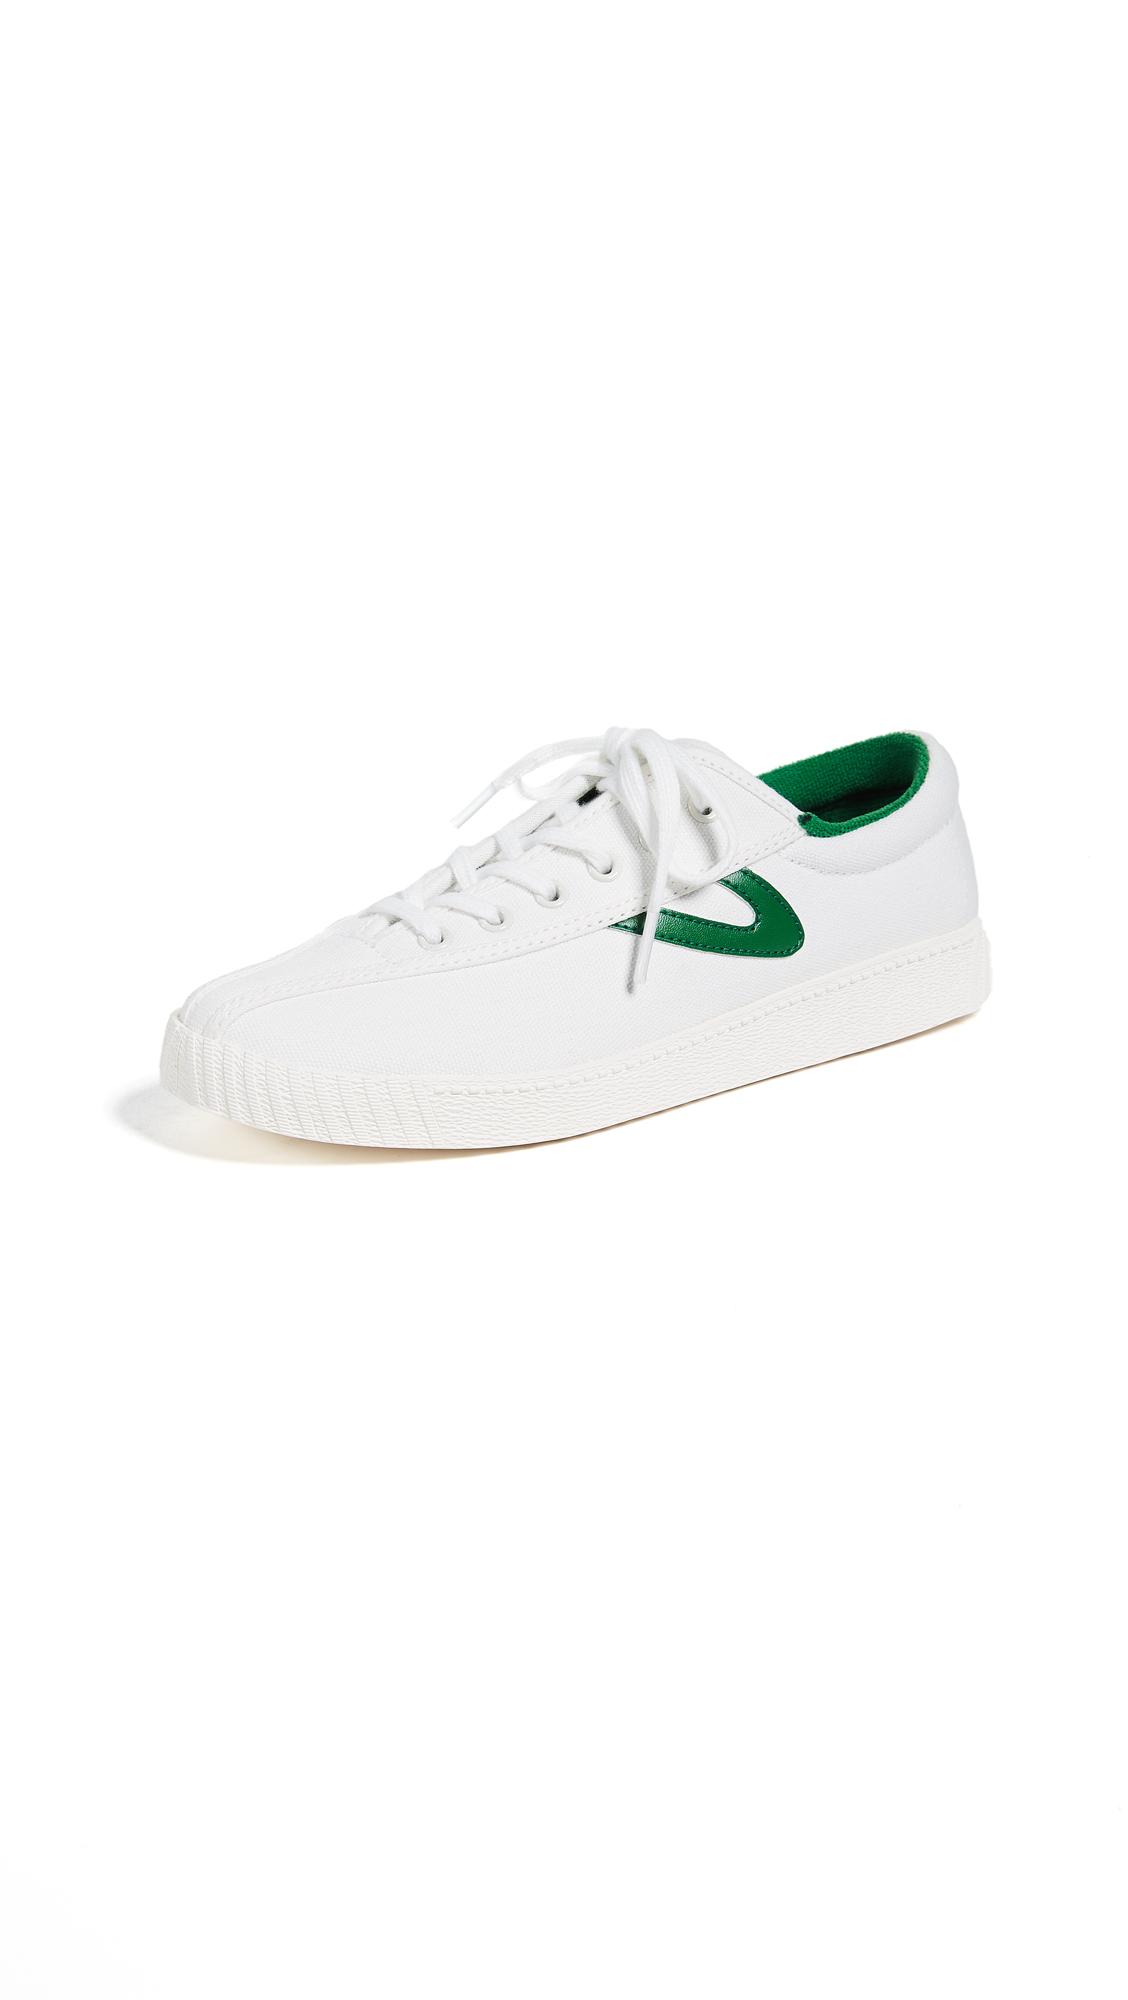 Tretorn Nylite Sneakers - Vintage White/Green